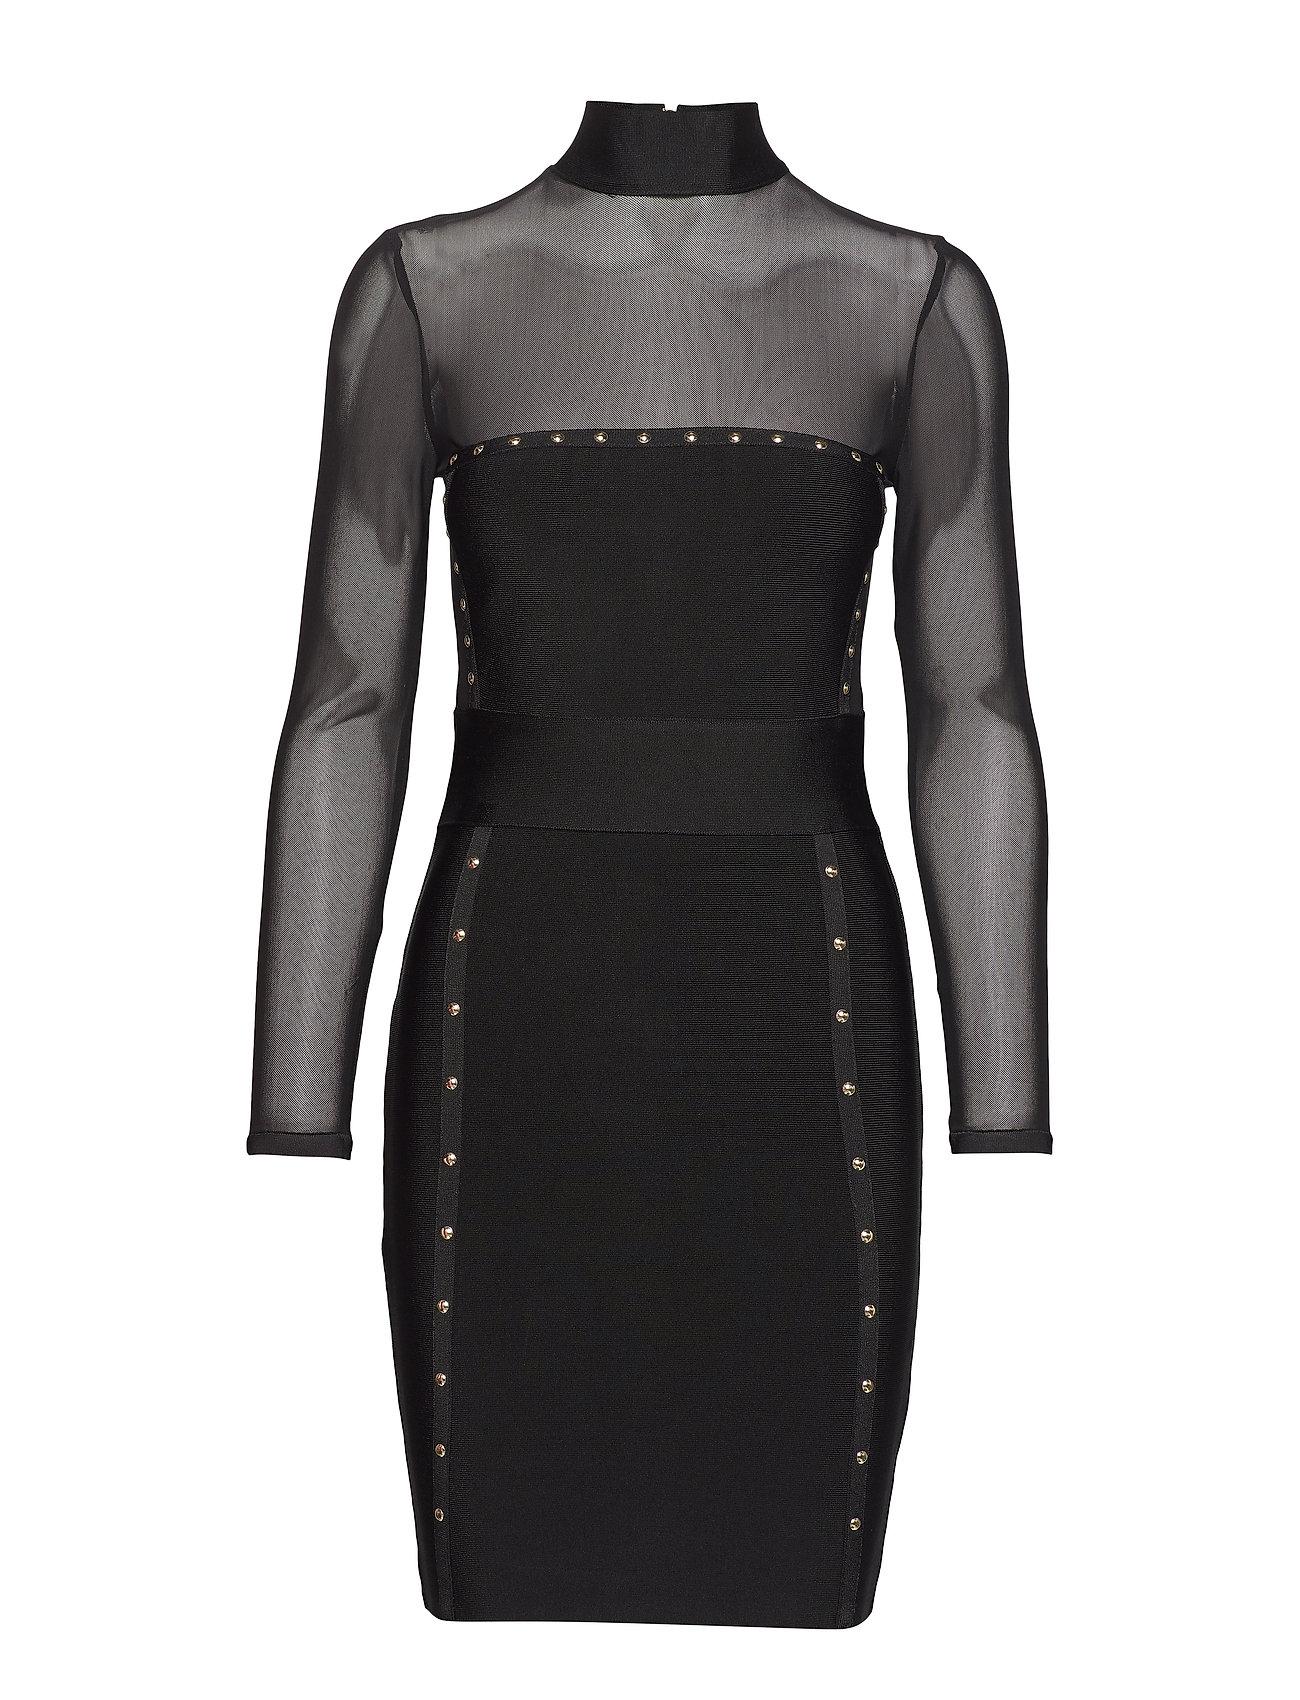 Marciano by GUESS SADIRA BANDAGE DRESS - BLACK FANCY BLACK